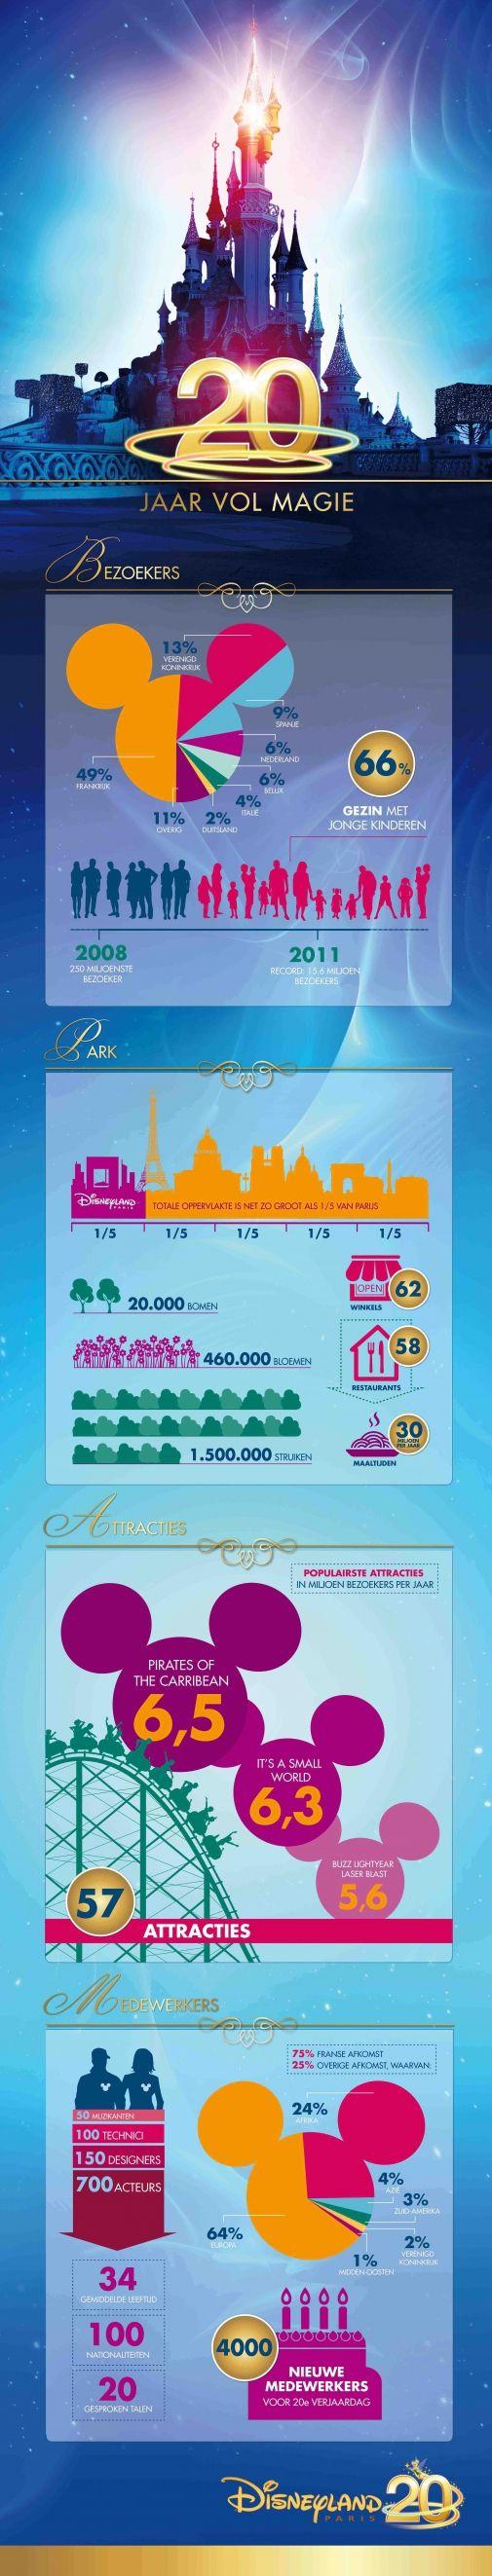 Disney20_infographic.jpg